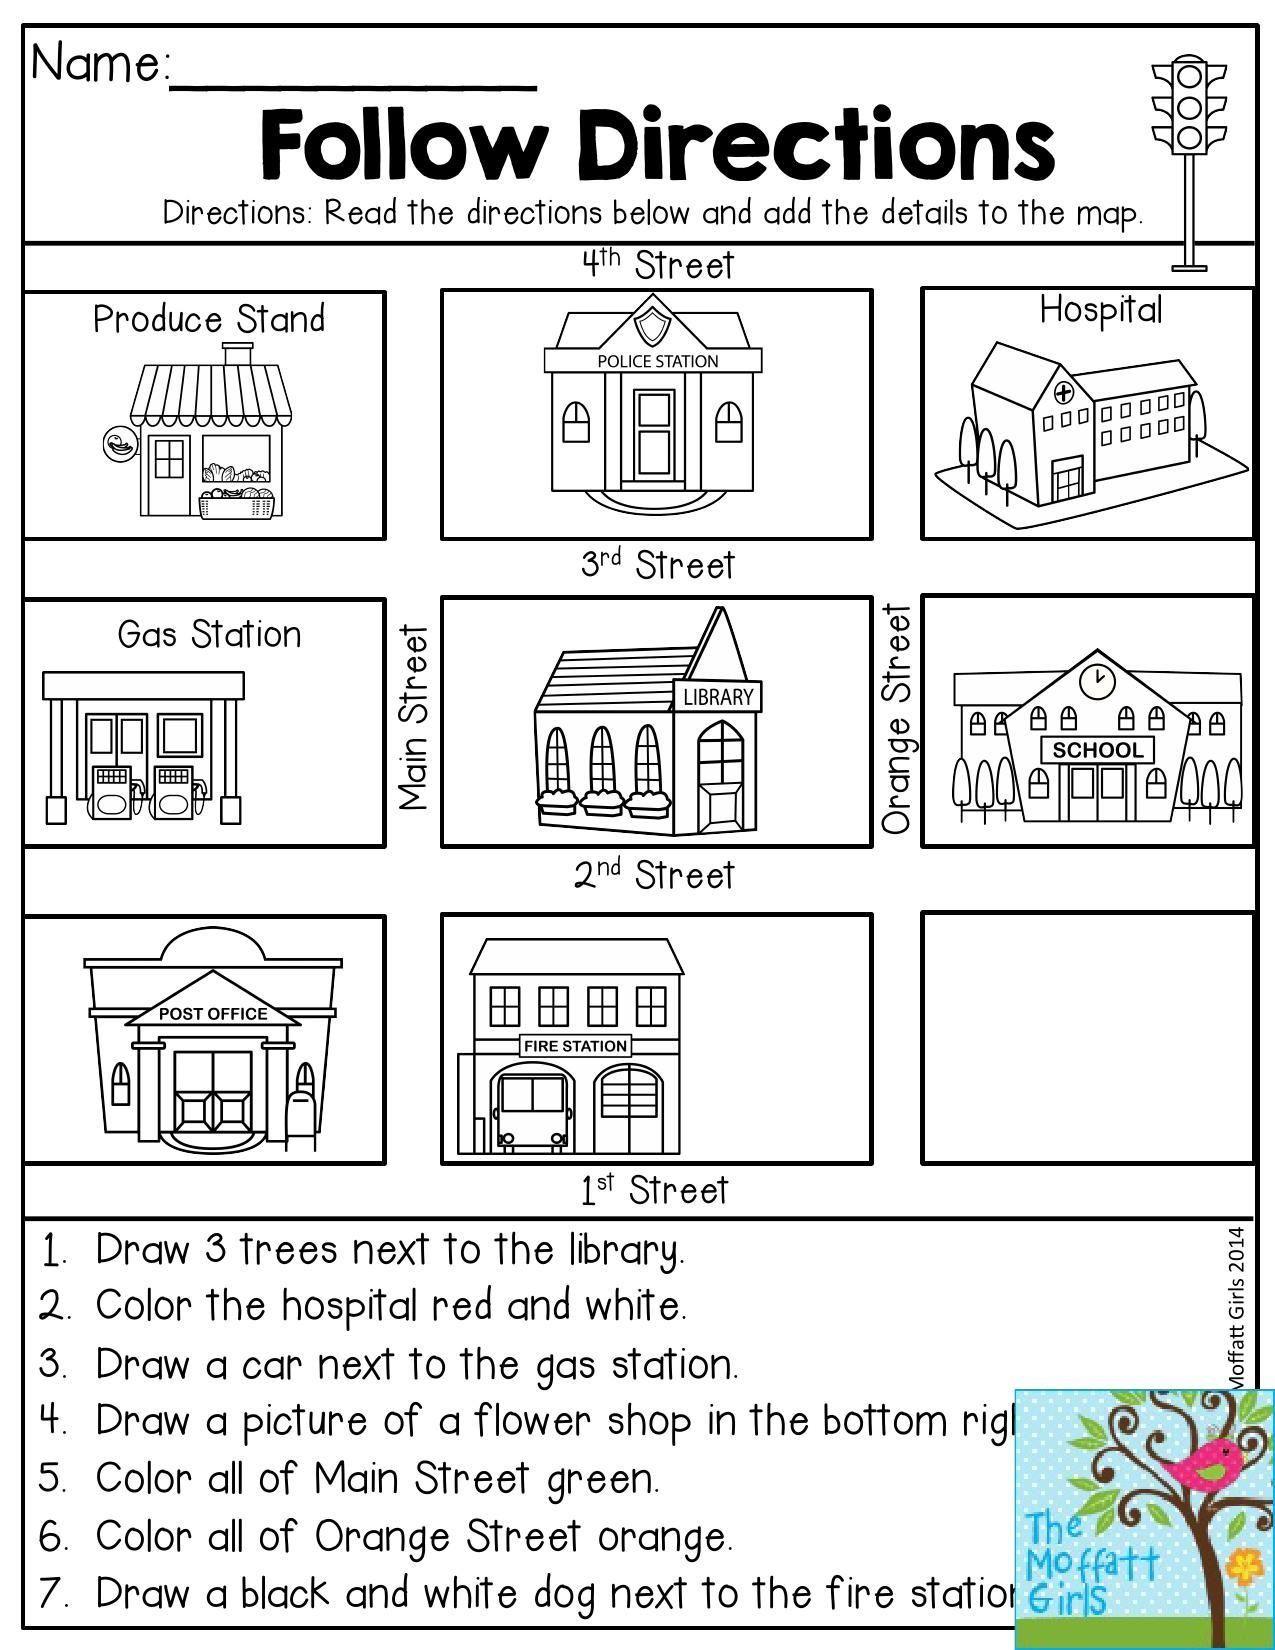 Following Directions Worksheet Kindergarten Follow Directions Read the Directions and Add the Details